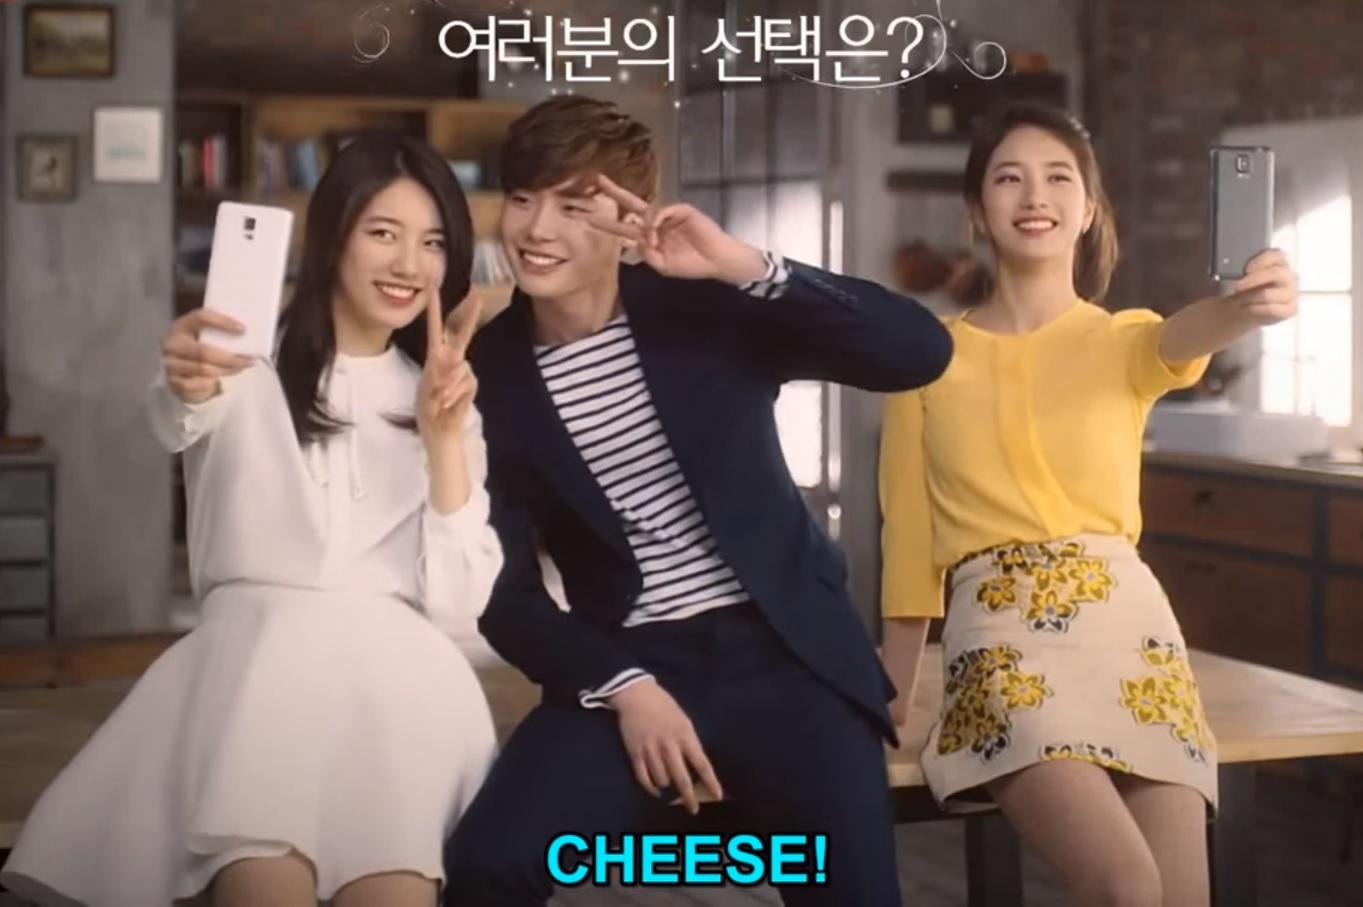 suzy and lee jong suk